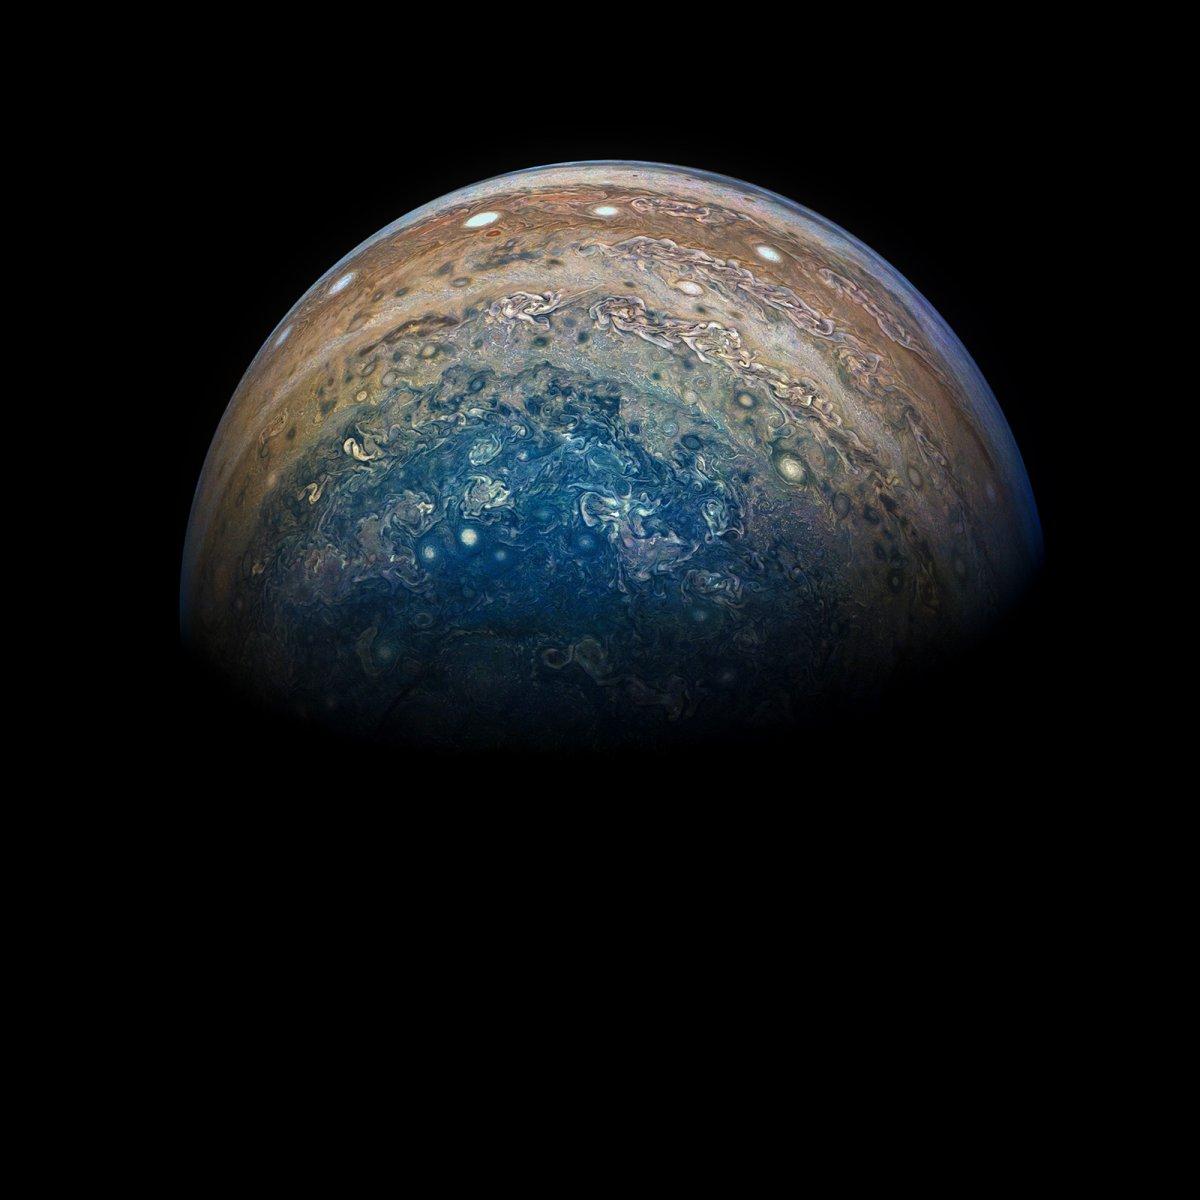 Juno bliżej niż dalej - NASA/JPL-Caltech/SwRI/MSSS/Gerald Eichstädt/Seán Doran